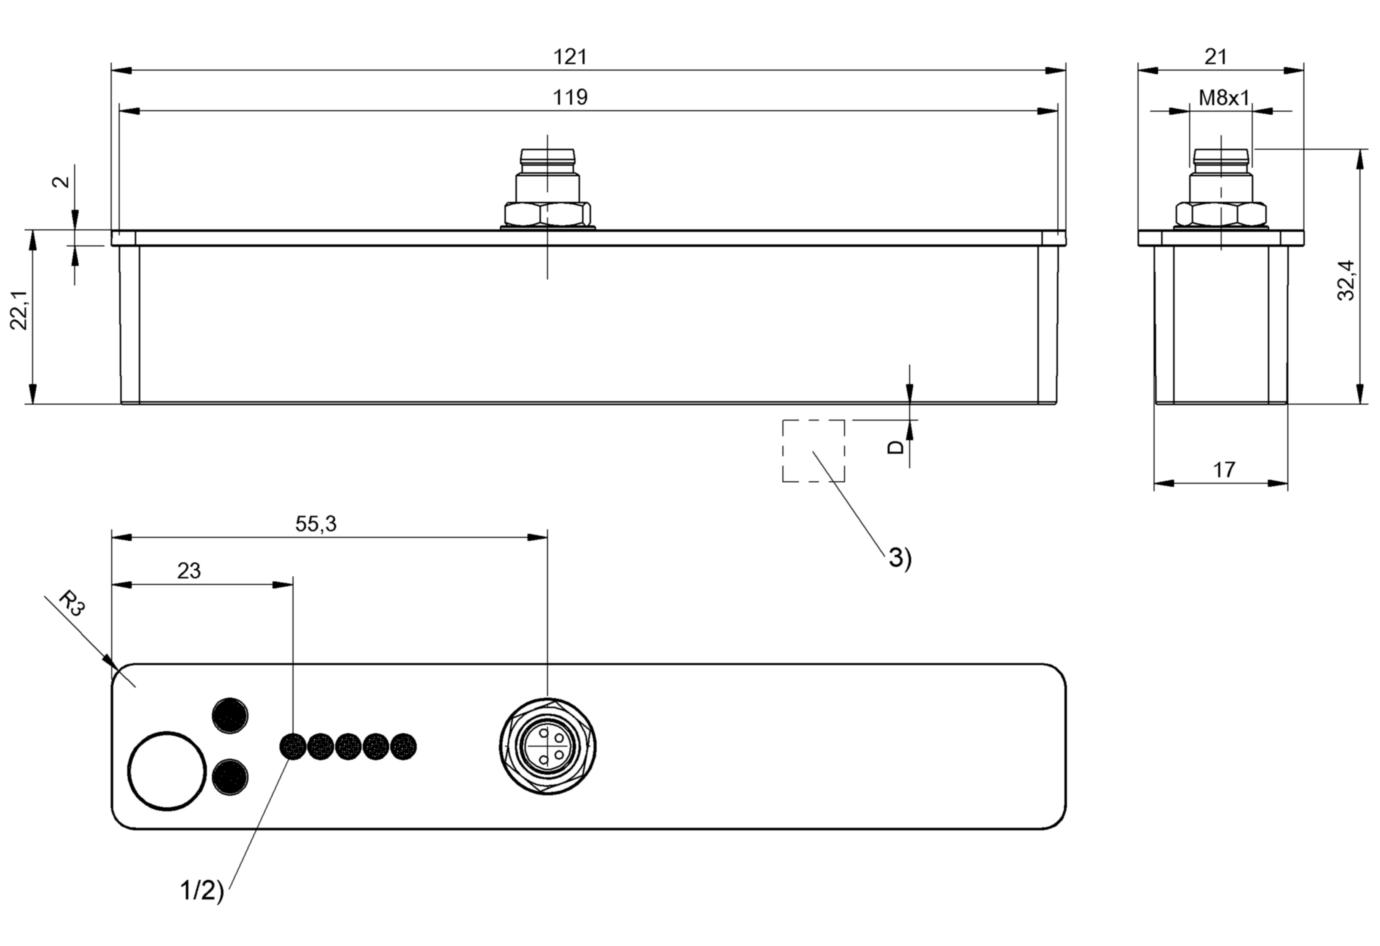 BIP0014 - BIP LD2-T103-03-S75 - Balluff on